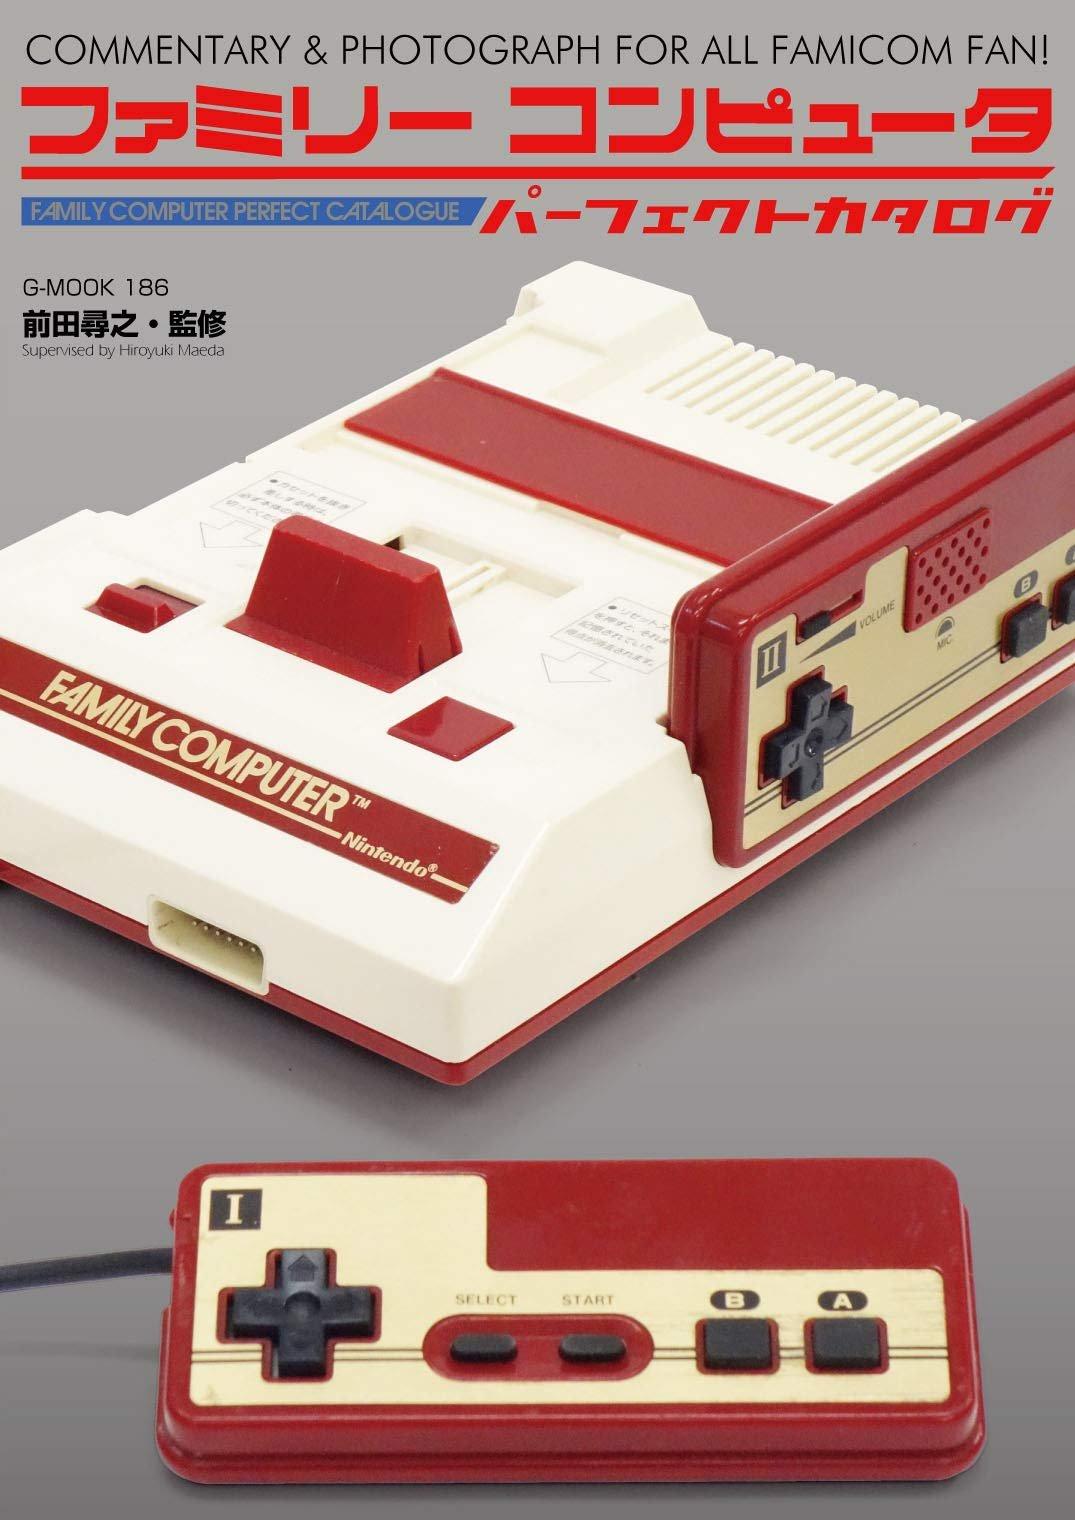 Family Computer Perfect Catalogue